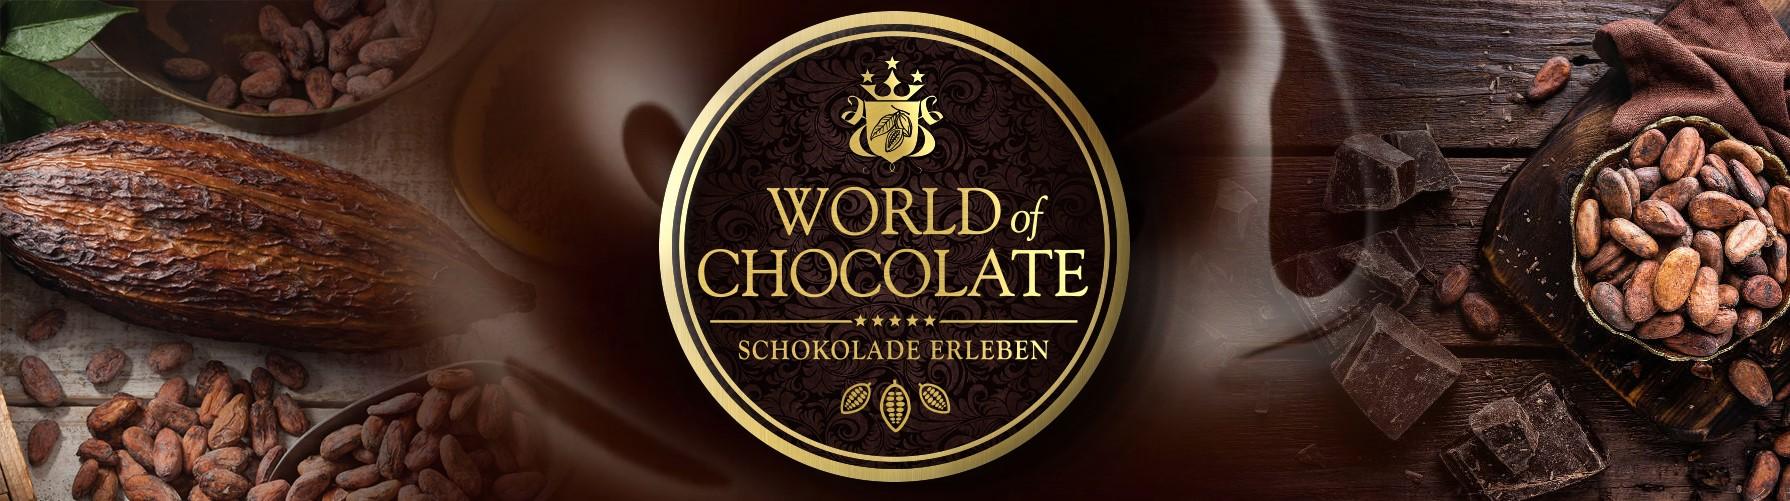 Chocolate Dinner 14.02.2020